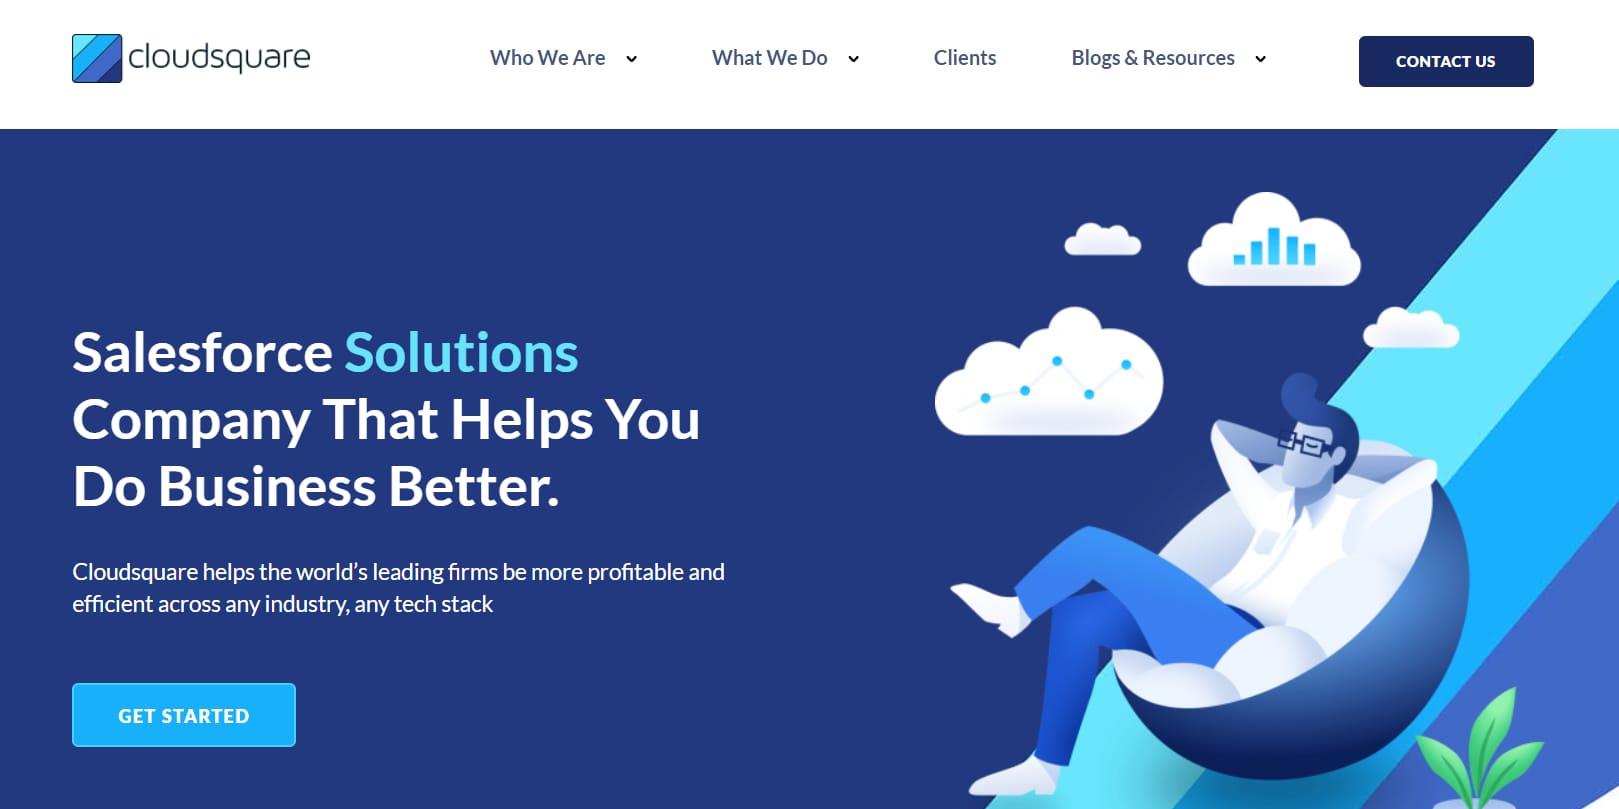 US-based-Salesforce-consultig-agencies-Cloudsquare